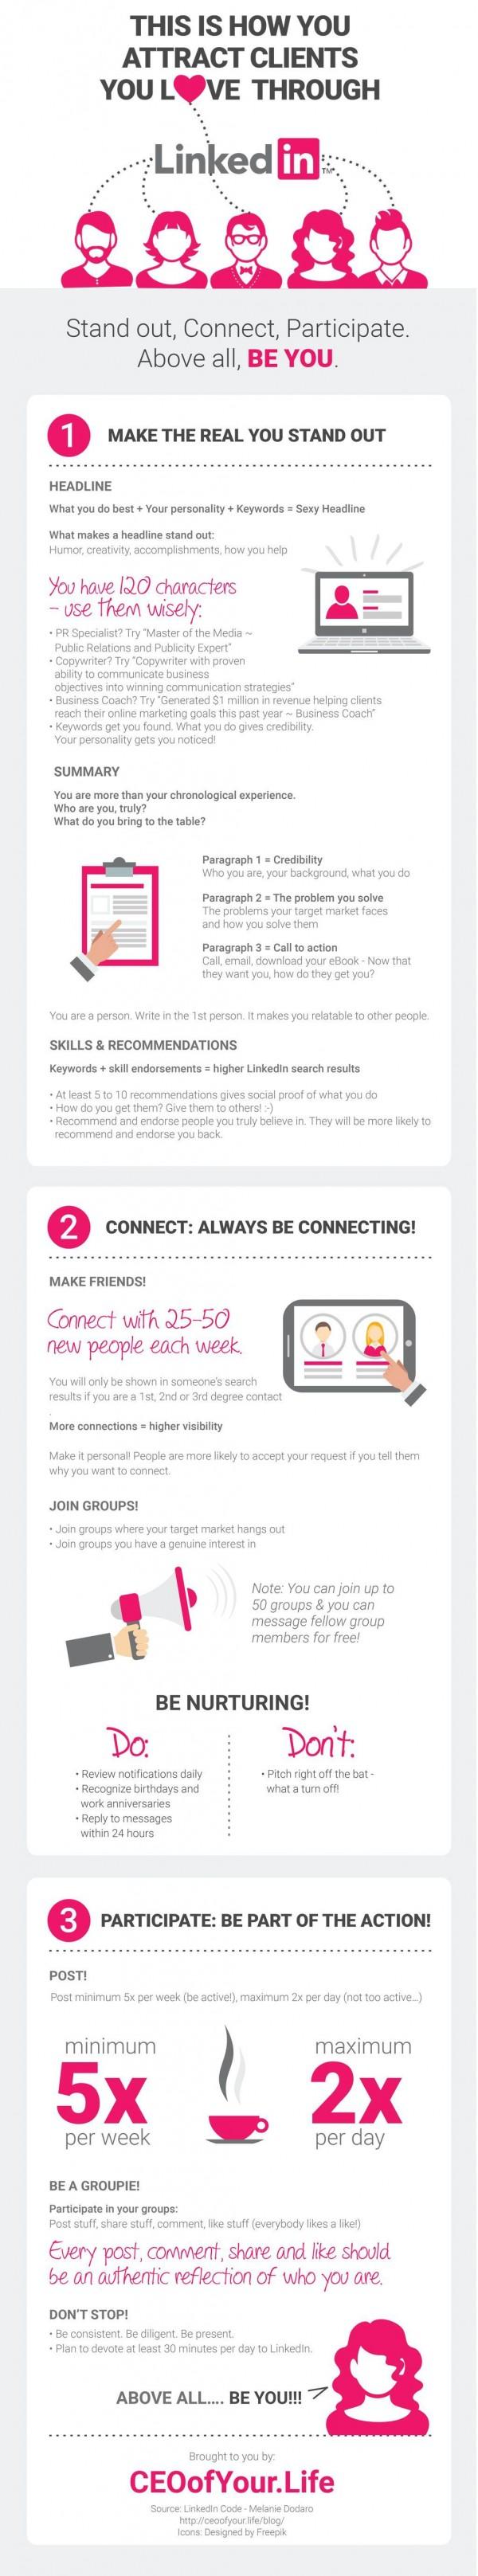 XXCómo atraer clientes en LinkedIn #infografía